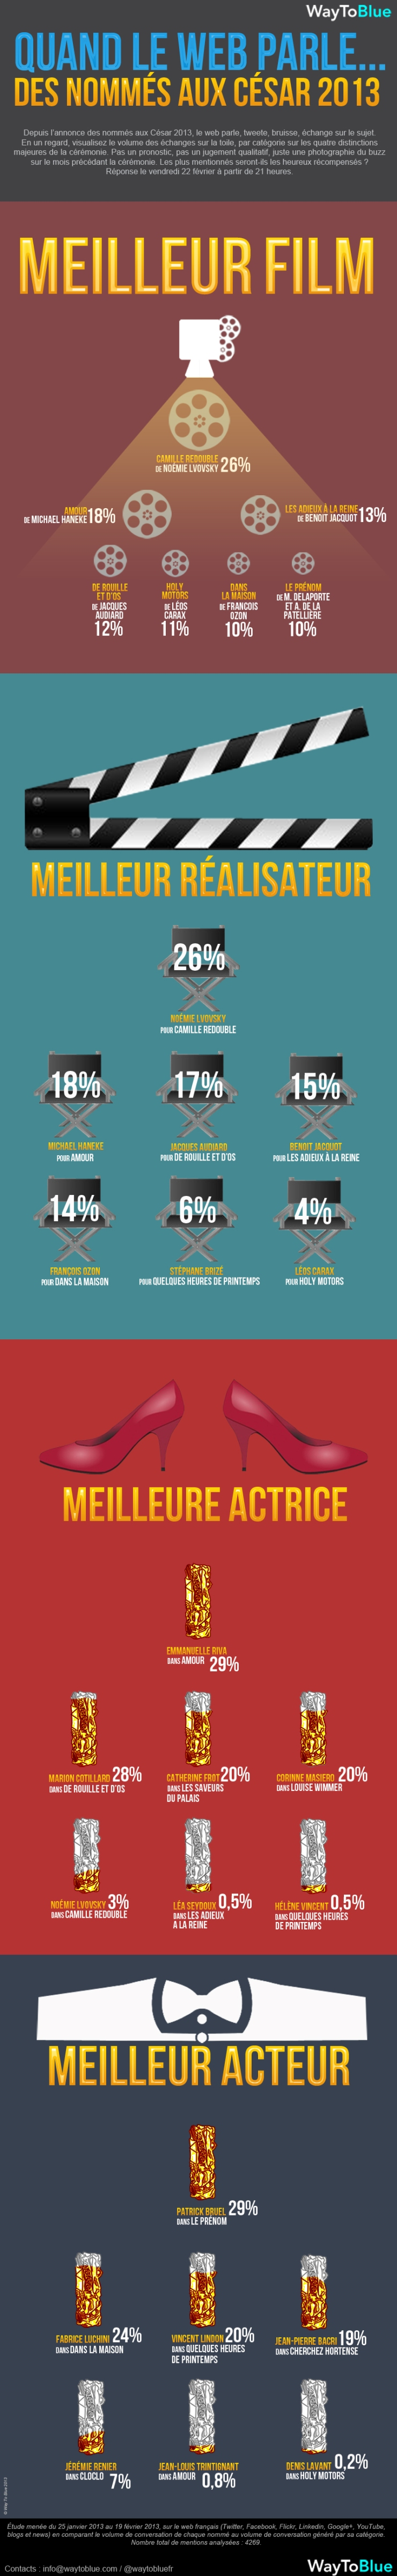 W2B_InfographieCesar2013